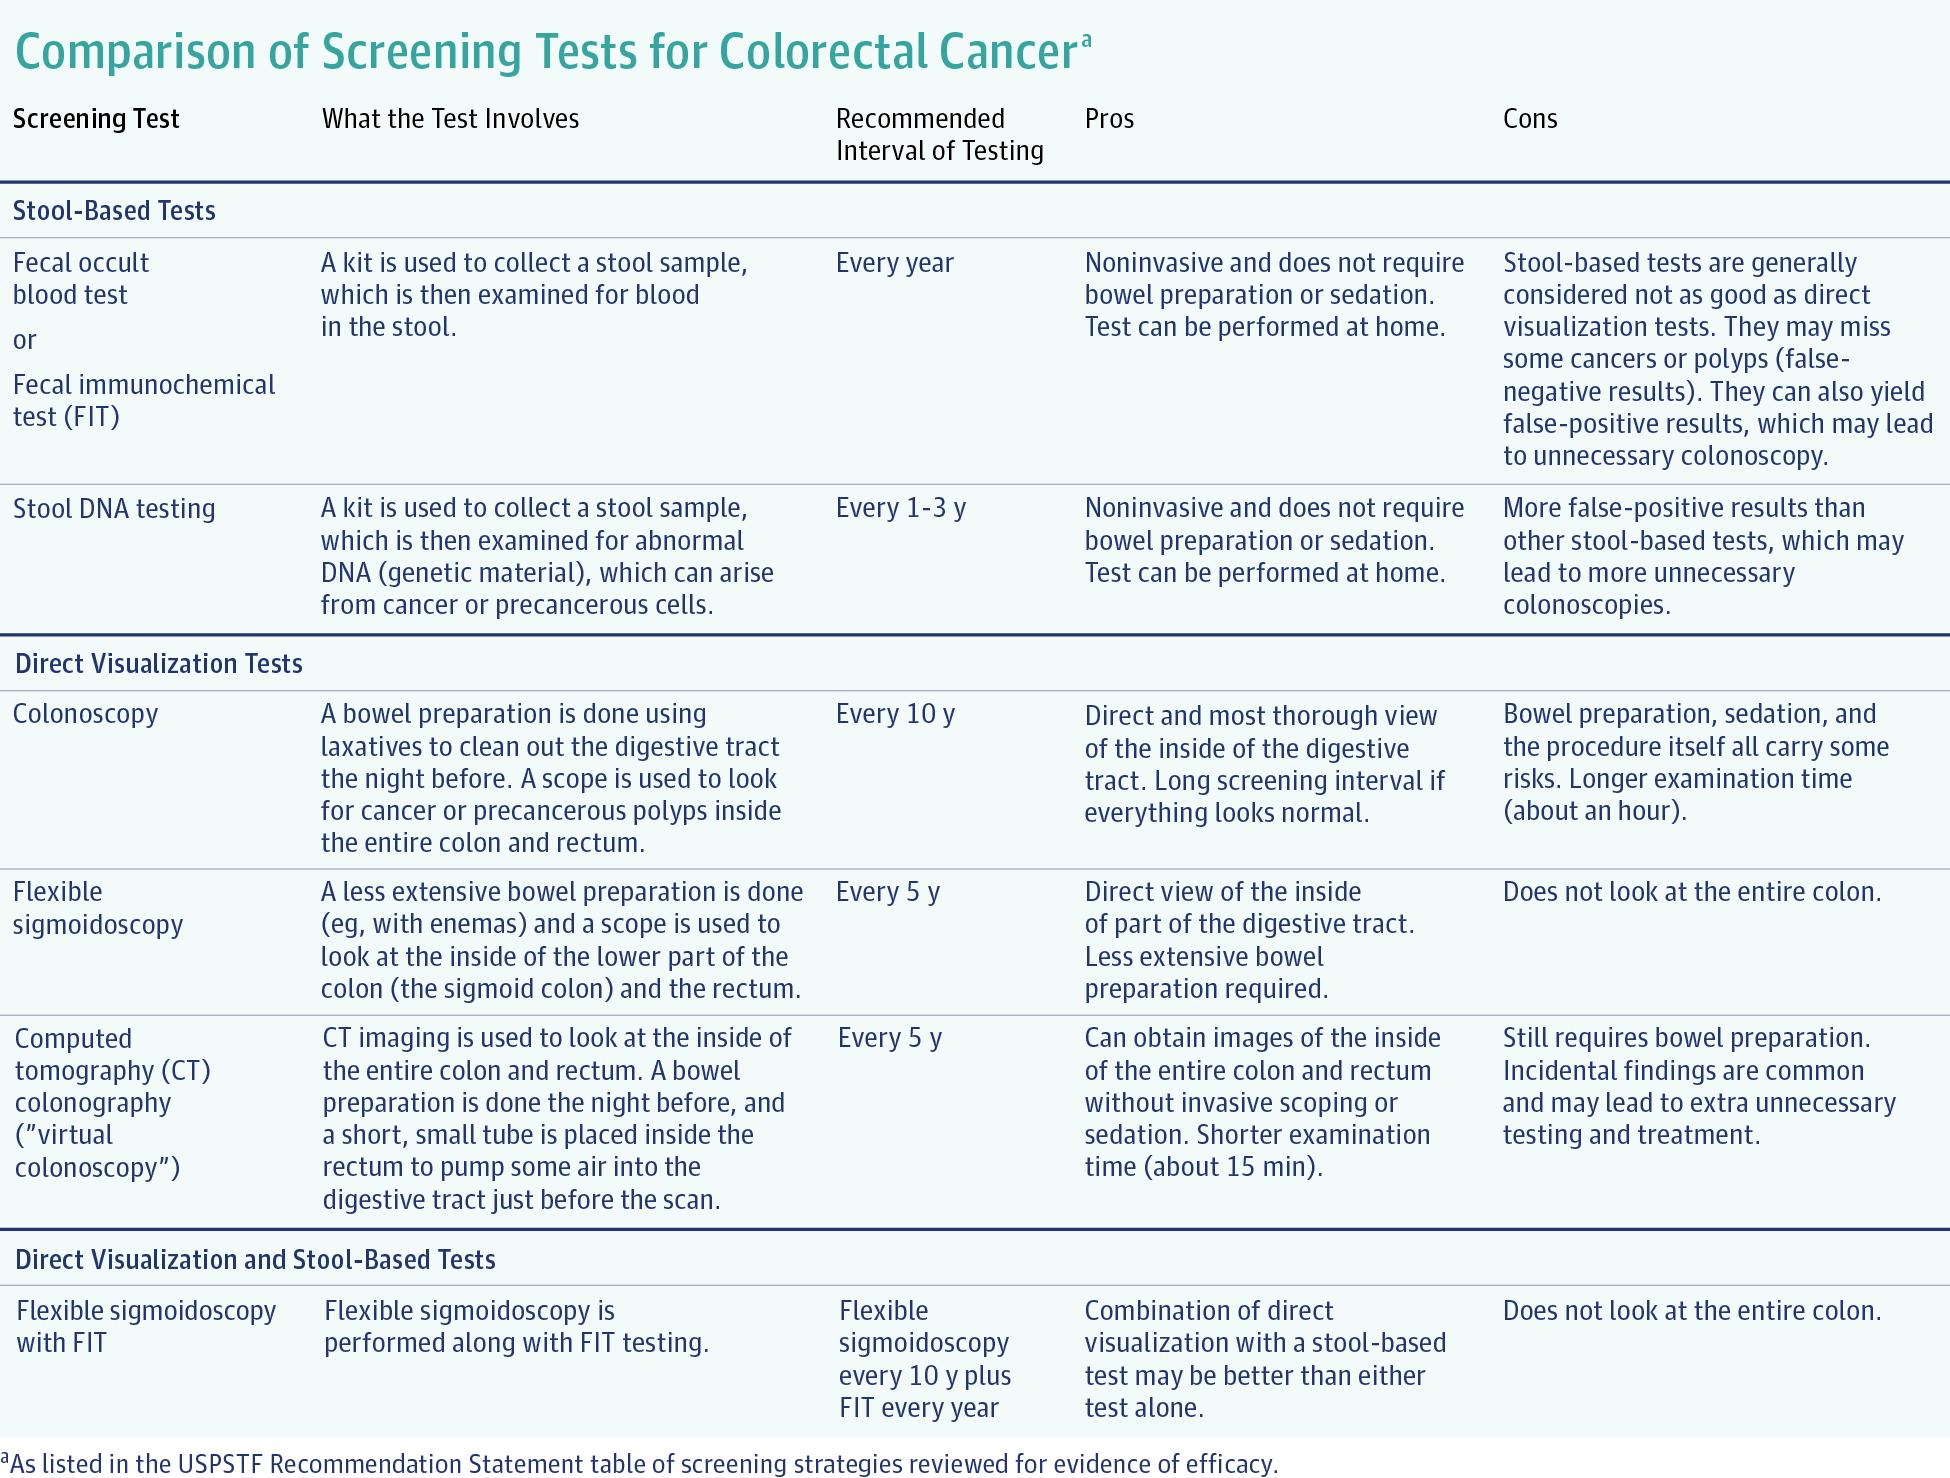 colorectal cancer jama